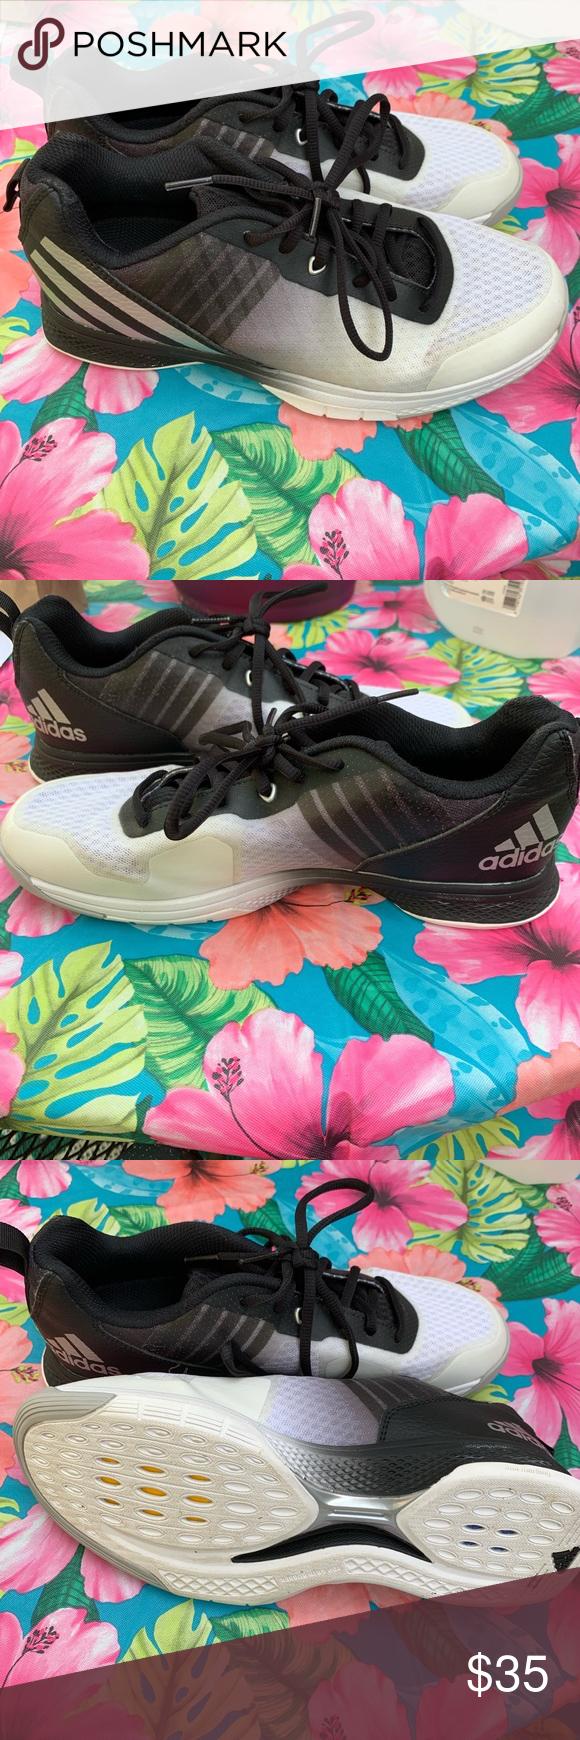 Adidas Volleyball Shoes Adidas Volleyball Shoes Volleyball Shoes Shoes